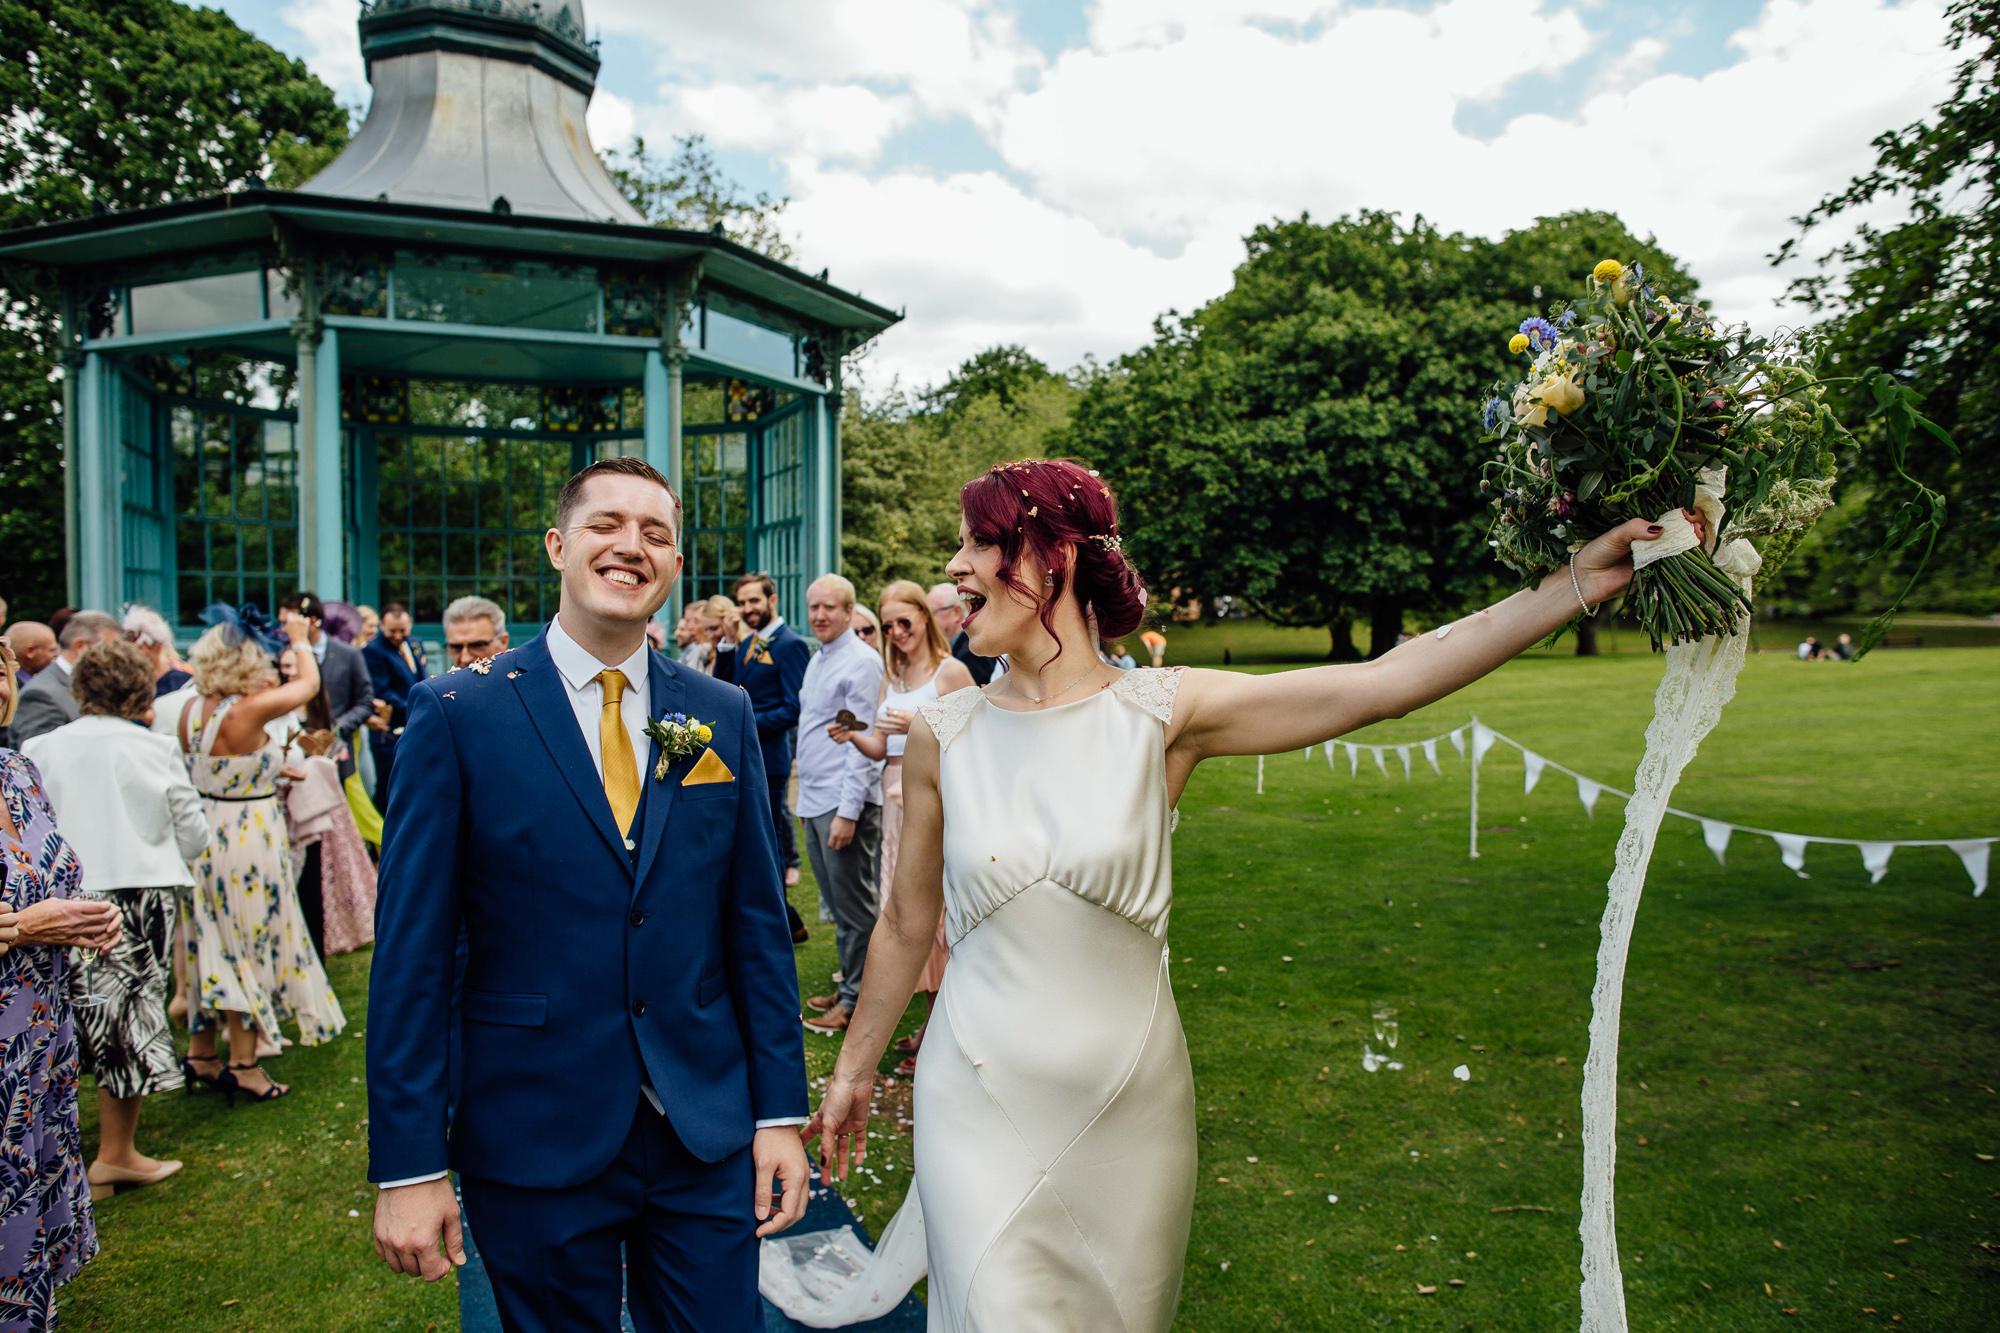 Sarah-Honeysuckle-Bias-Cut-Silk-Vintage-Inspired-Wedding-Gown-Sheffield-Wedding-Kate-Beaumont-28.jpg